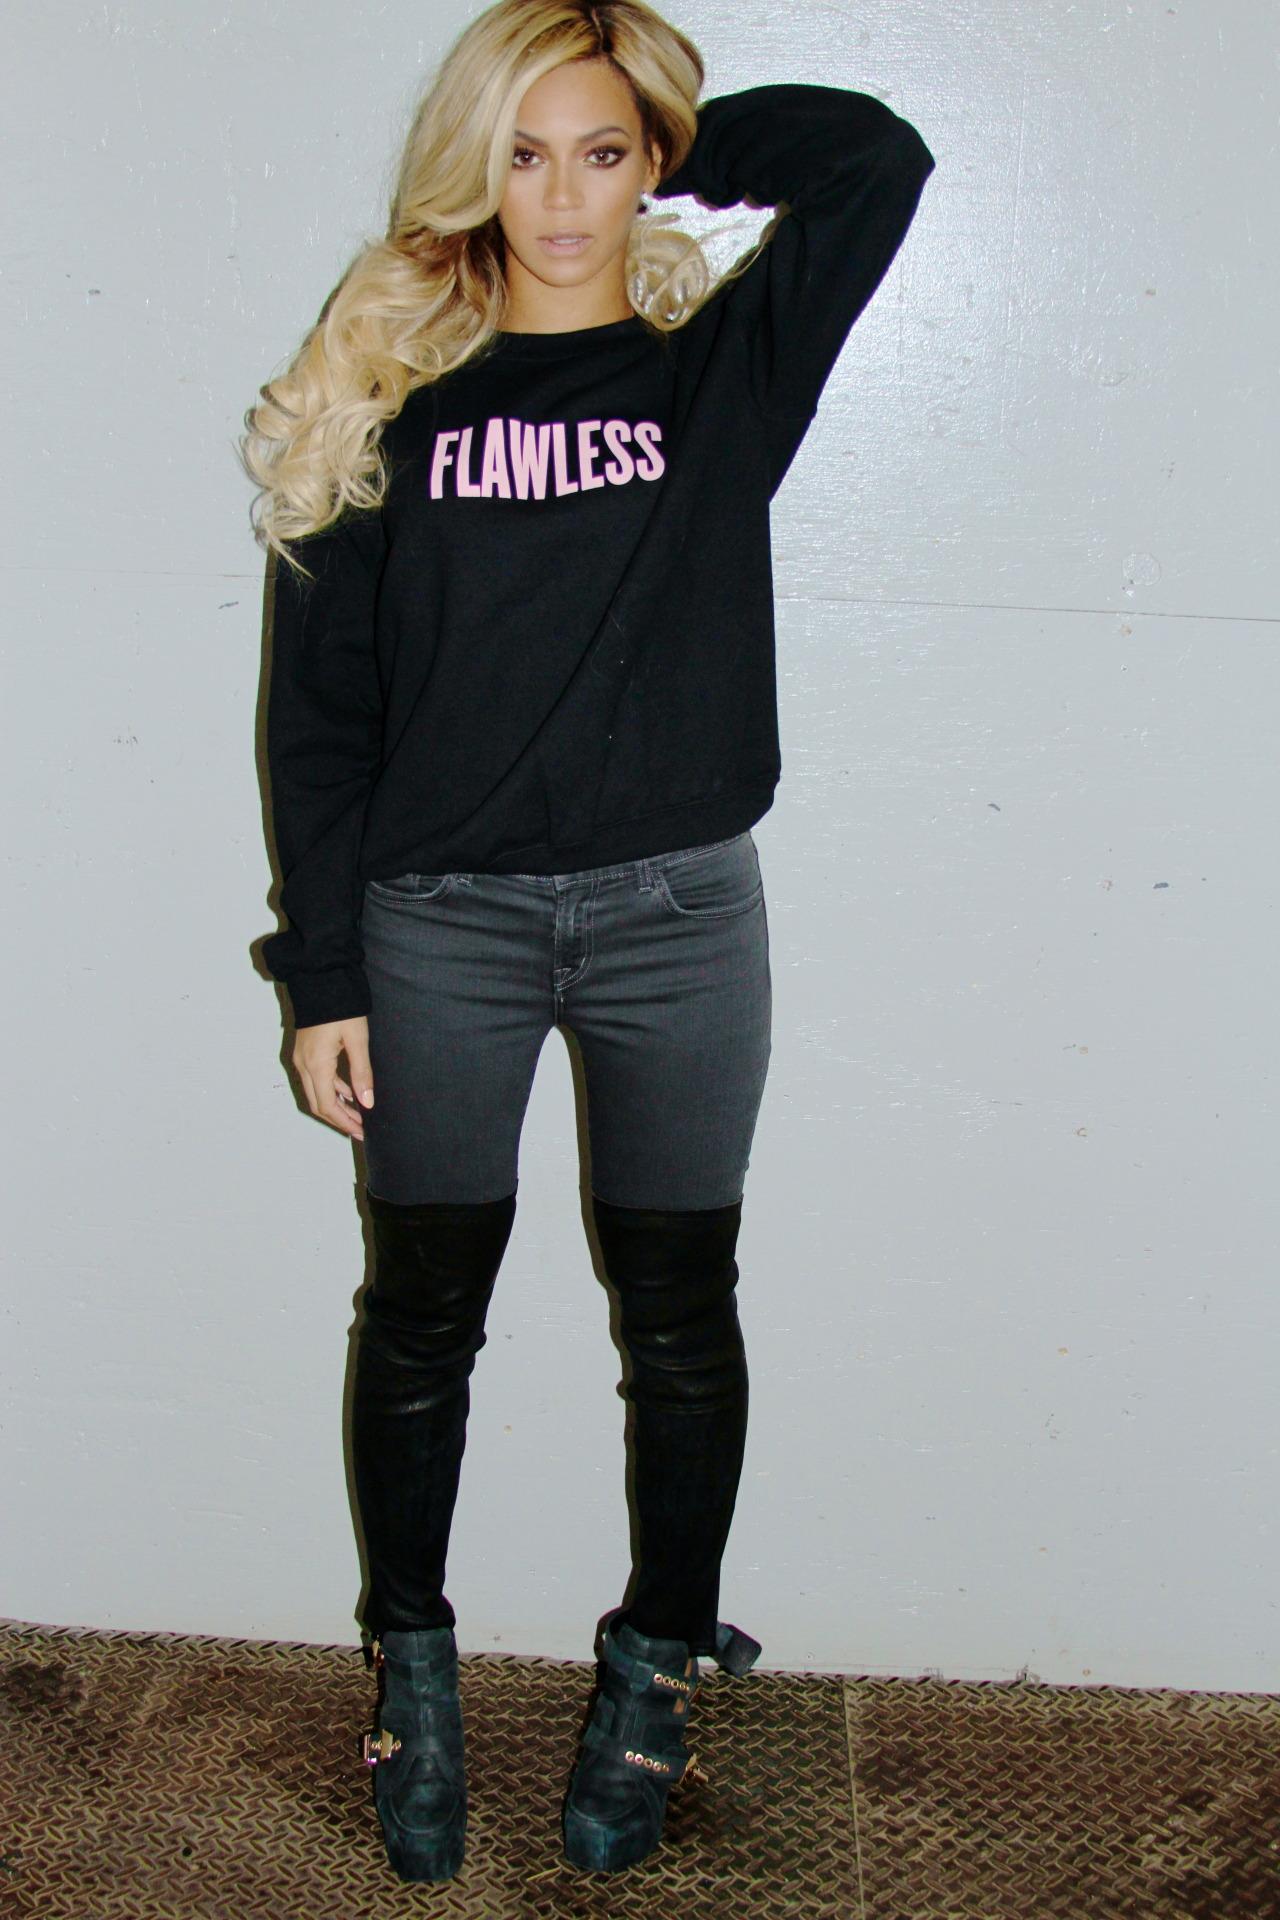 Beyoncé - Twitter (@Beyonce), Instagram (Baddiebey), Tumblr (I Am...) [II] - Página 2 Tumblr_n0i5fiGk7F1rqgjz2o1_1280